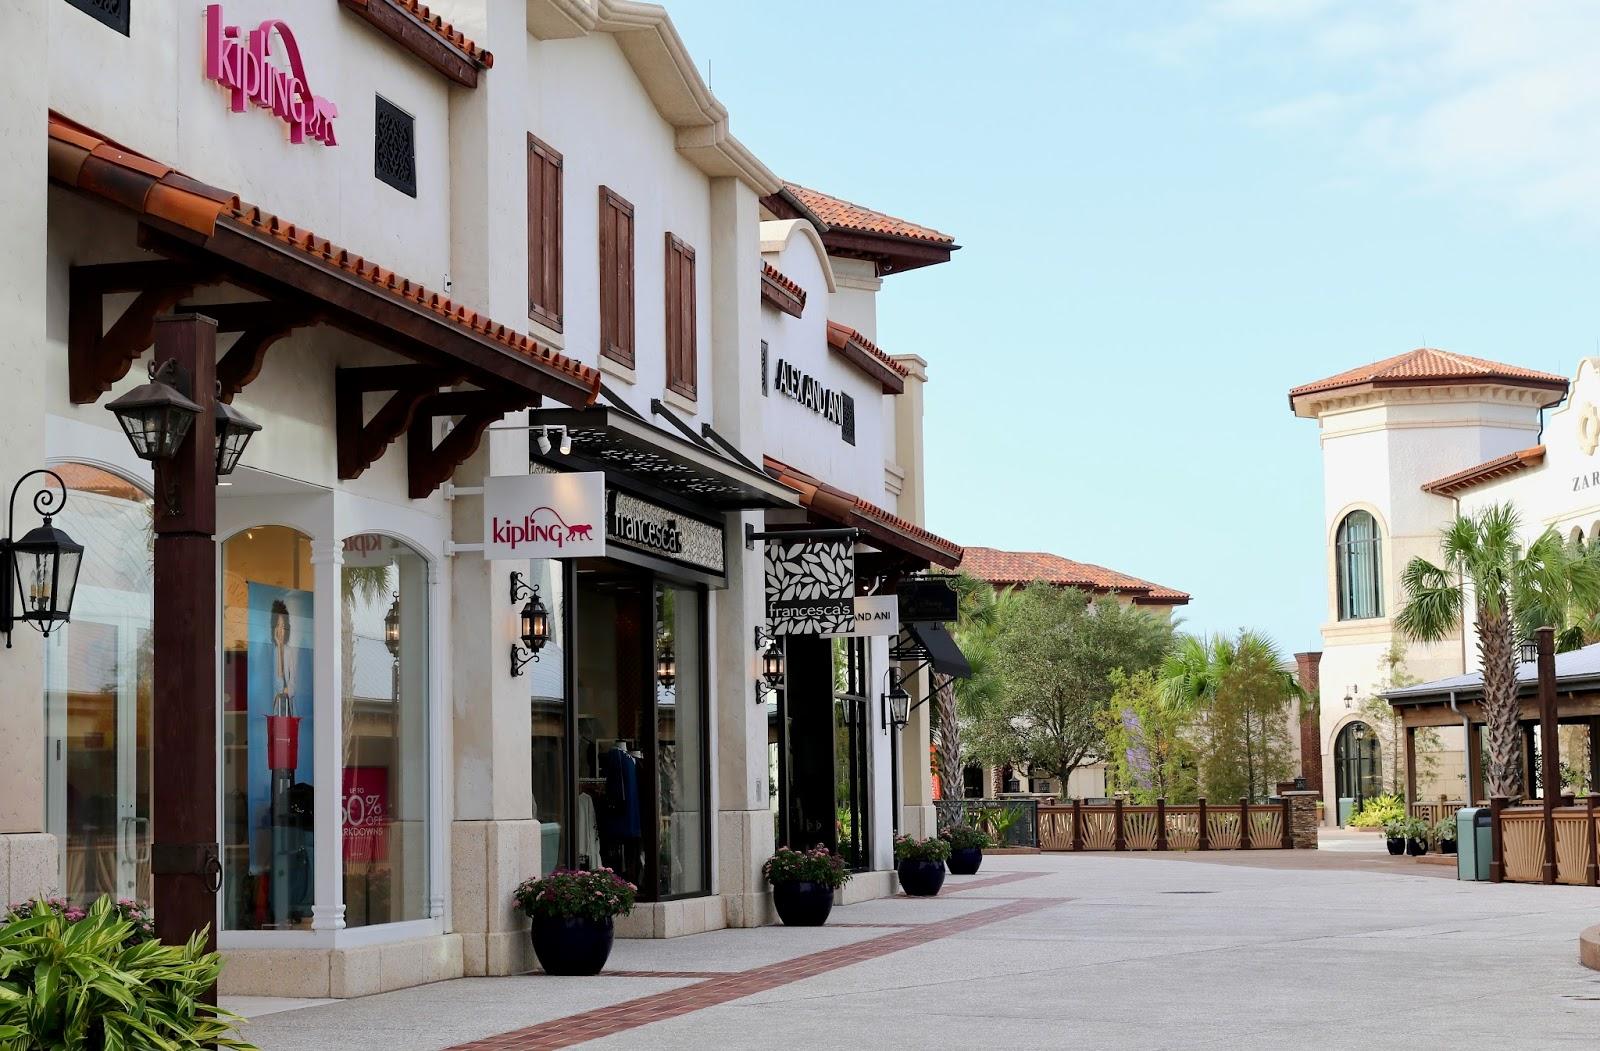 Disney-Springs-stores-Kipling-Zara